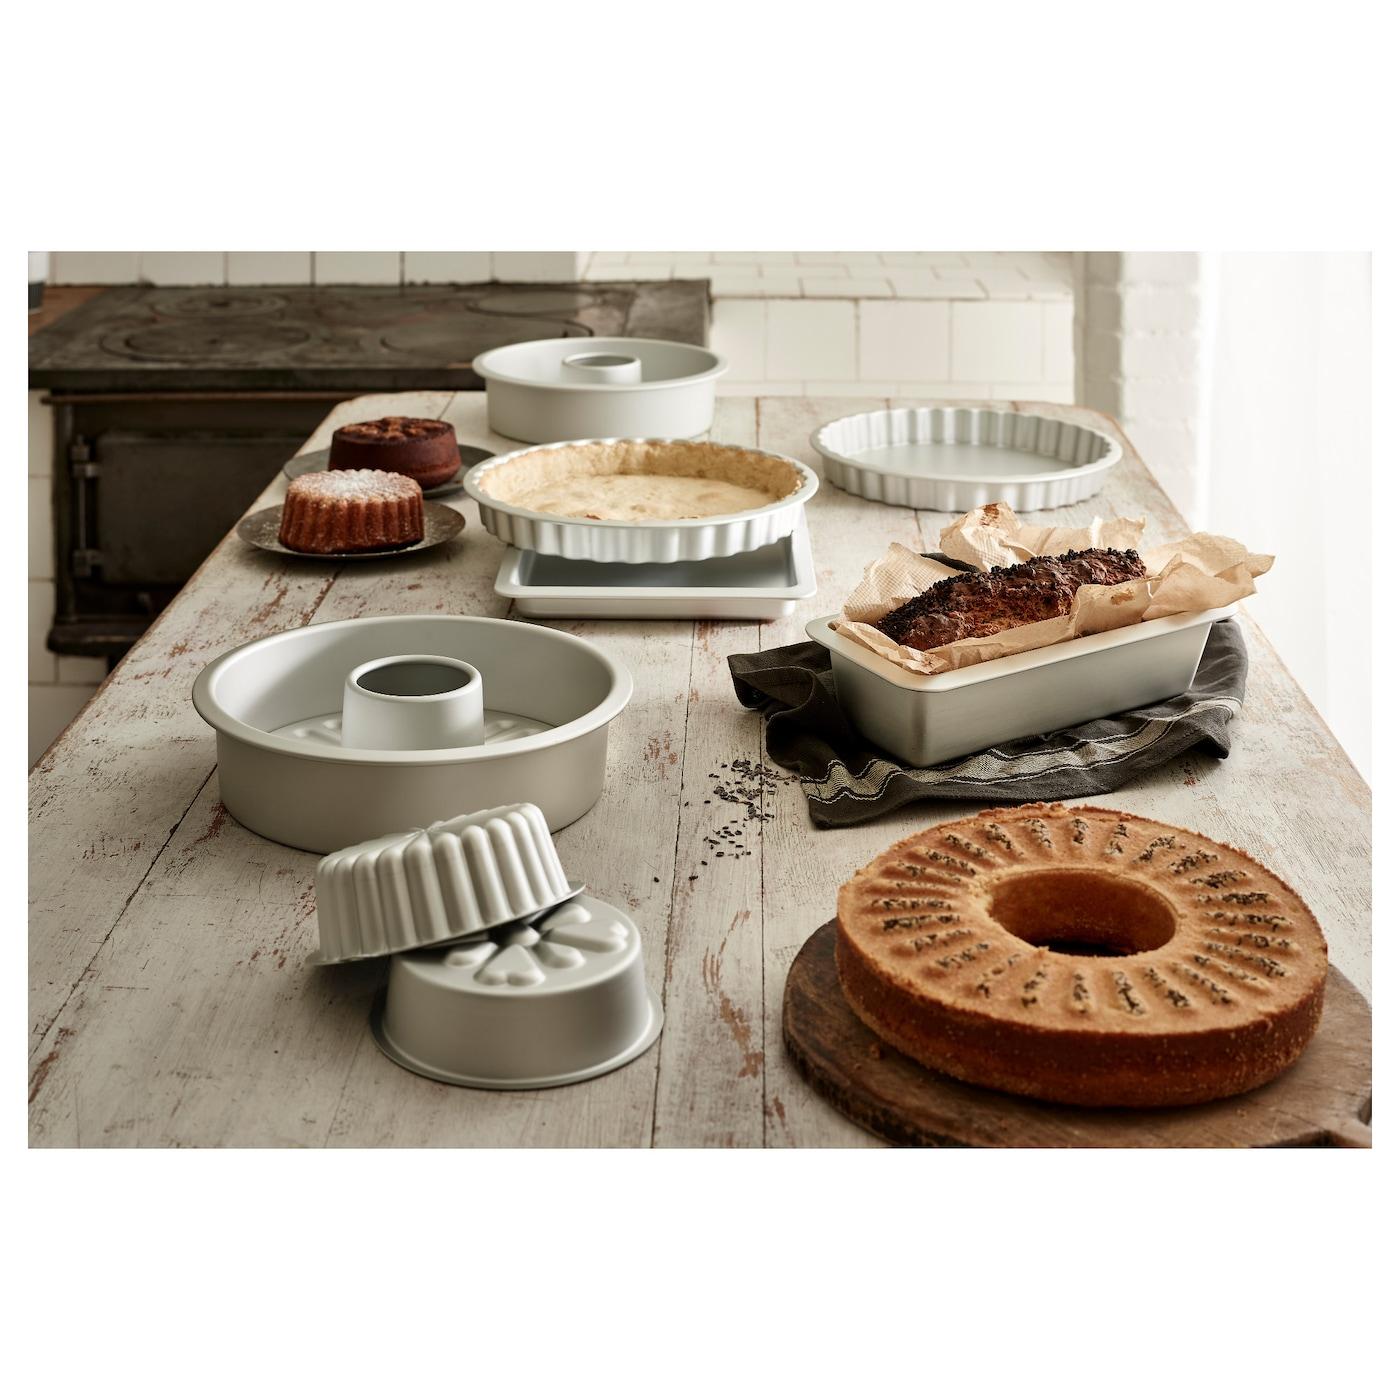 VARDAGEN Cake pan, silver color